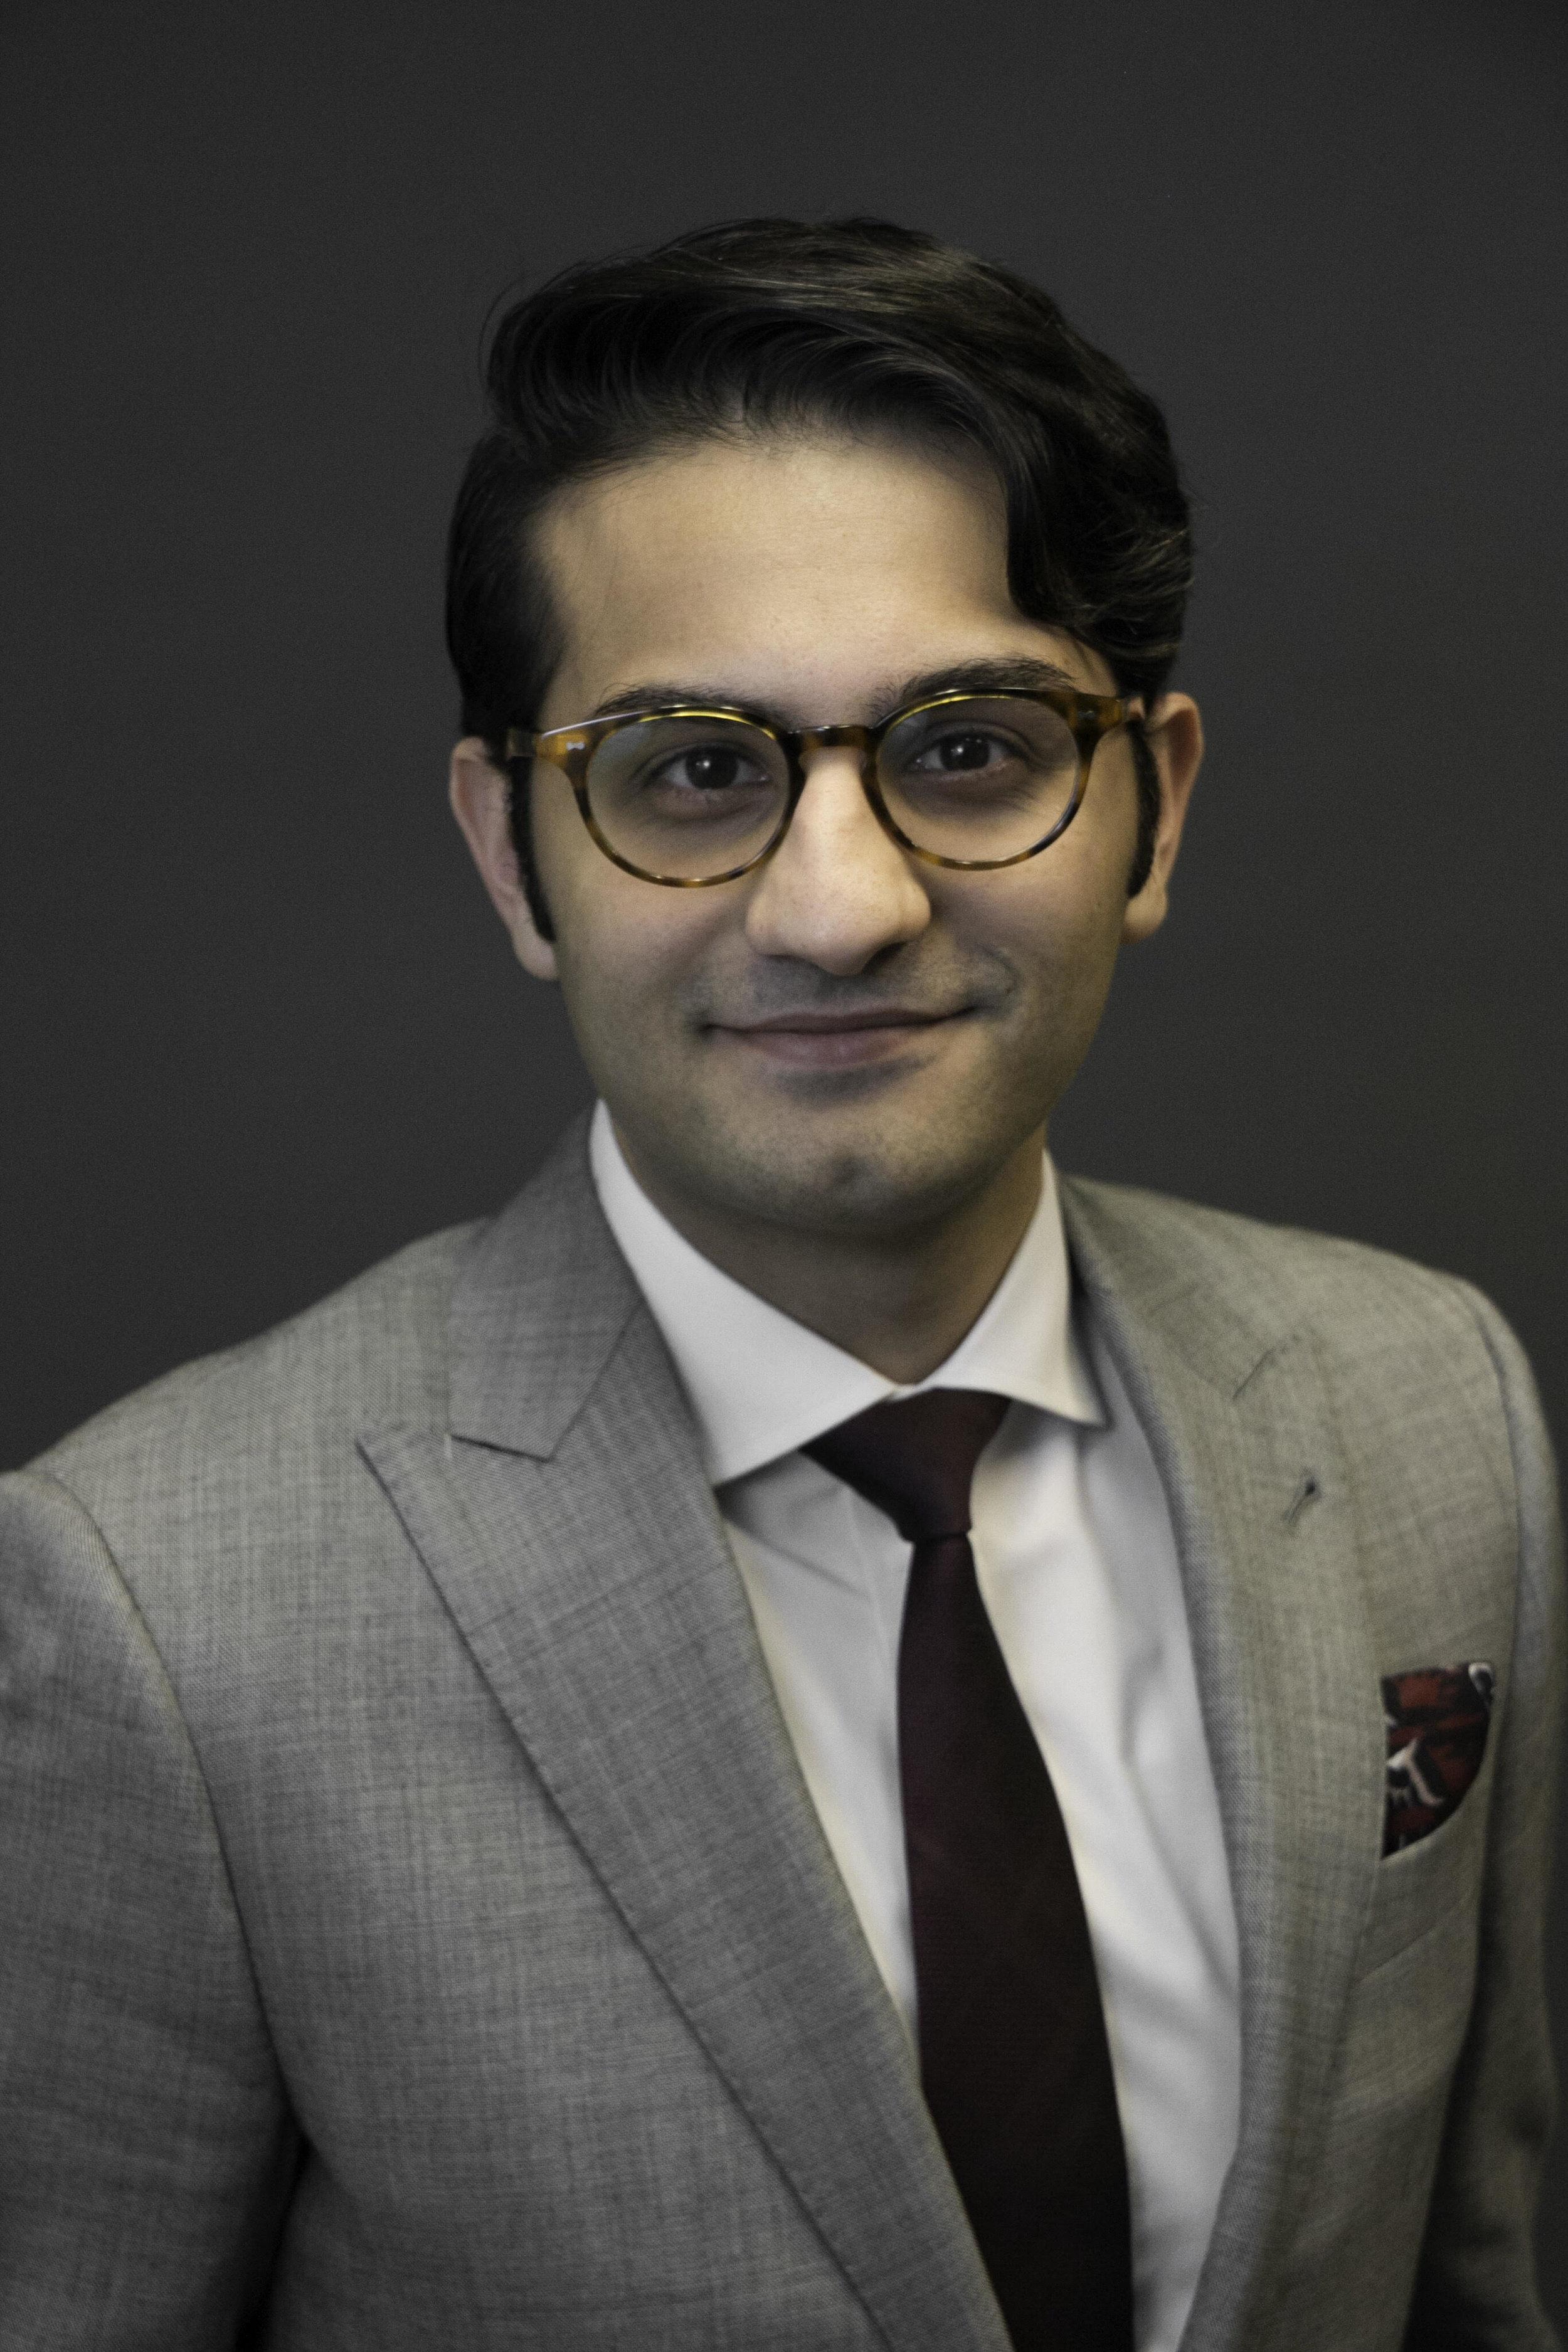 Nafees Uddin - nuddin@noldmuchlaw.com425-289-5555Attorney